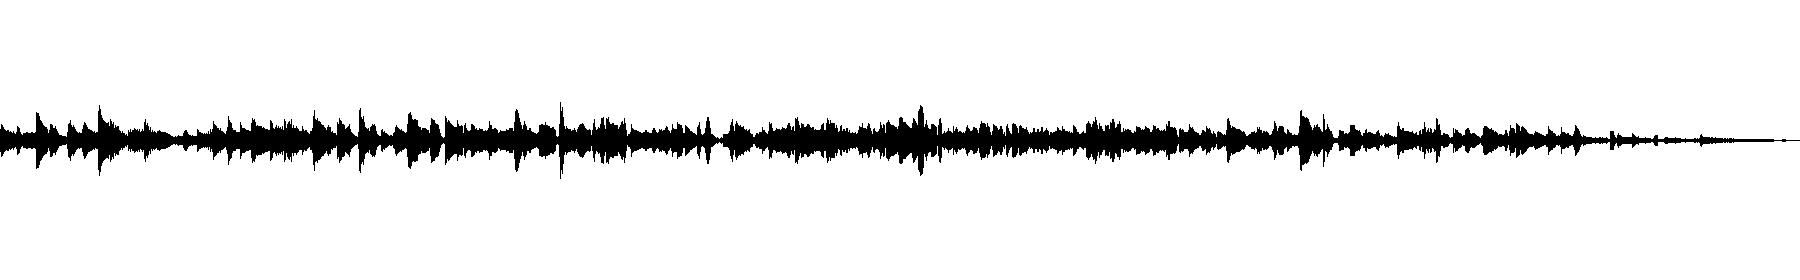 arab riff 2